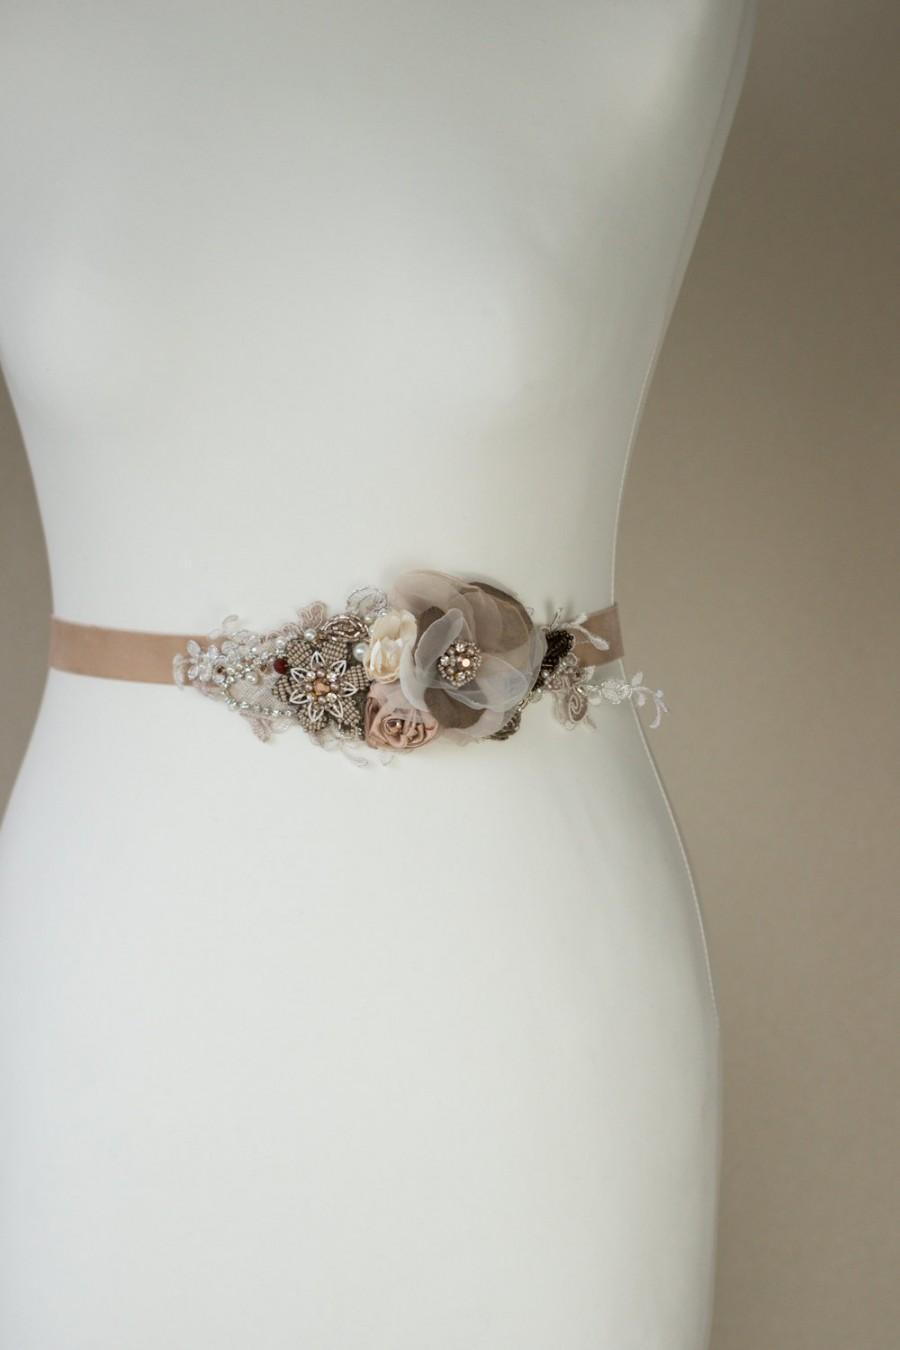 زفاف - Wedding dress belt, Rustic bridal sash, Flowered sash, floral sash, Rust wedding, Brass Champagne Rose Tan Beige Mink Brown Silver OOAK